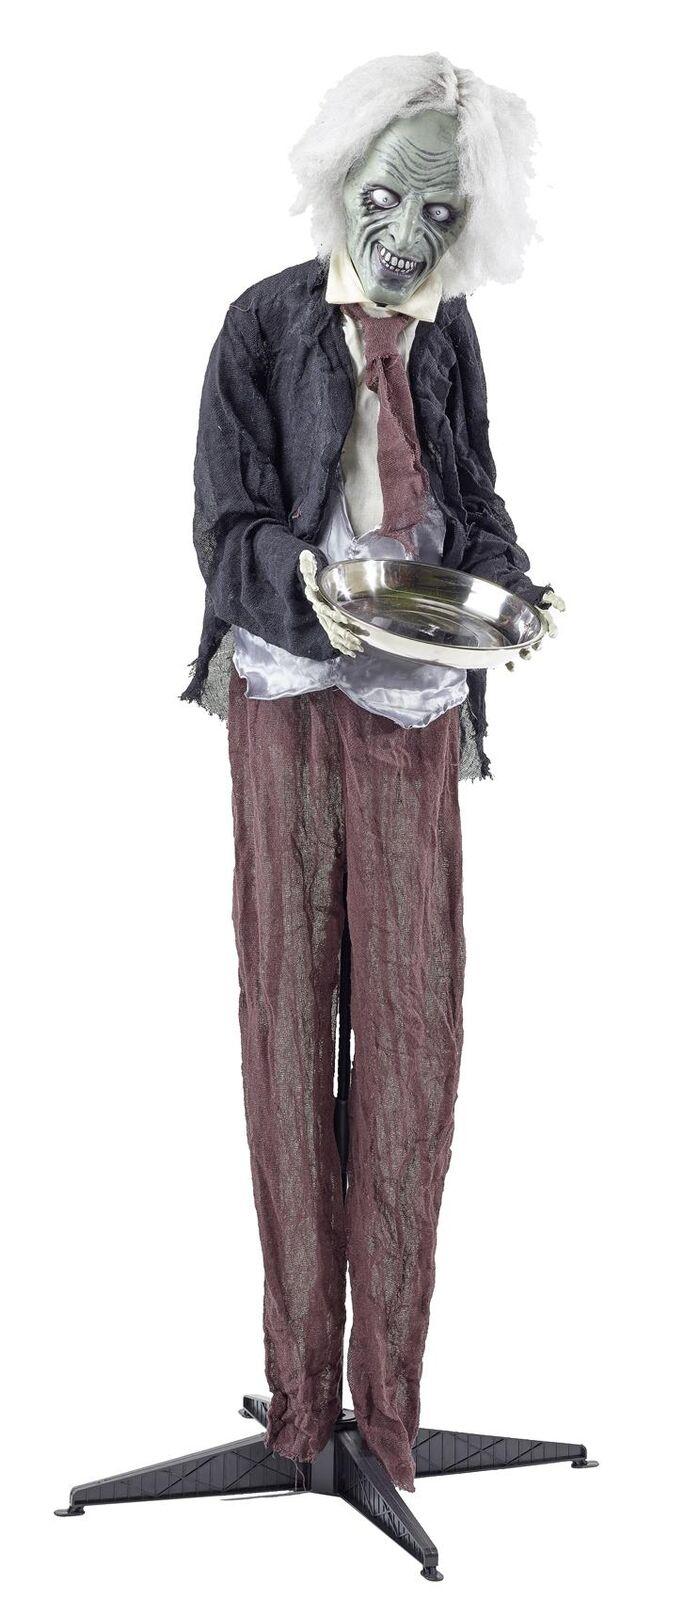 Halloween Butler Kellner Figur 160 cm lebensgroß Animation Animation Animation Dekoration gruselig ca0577